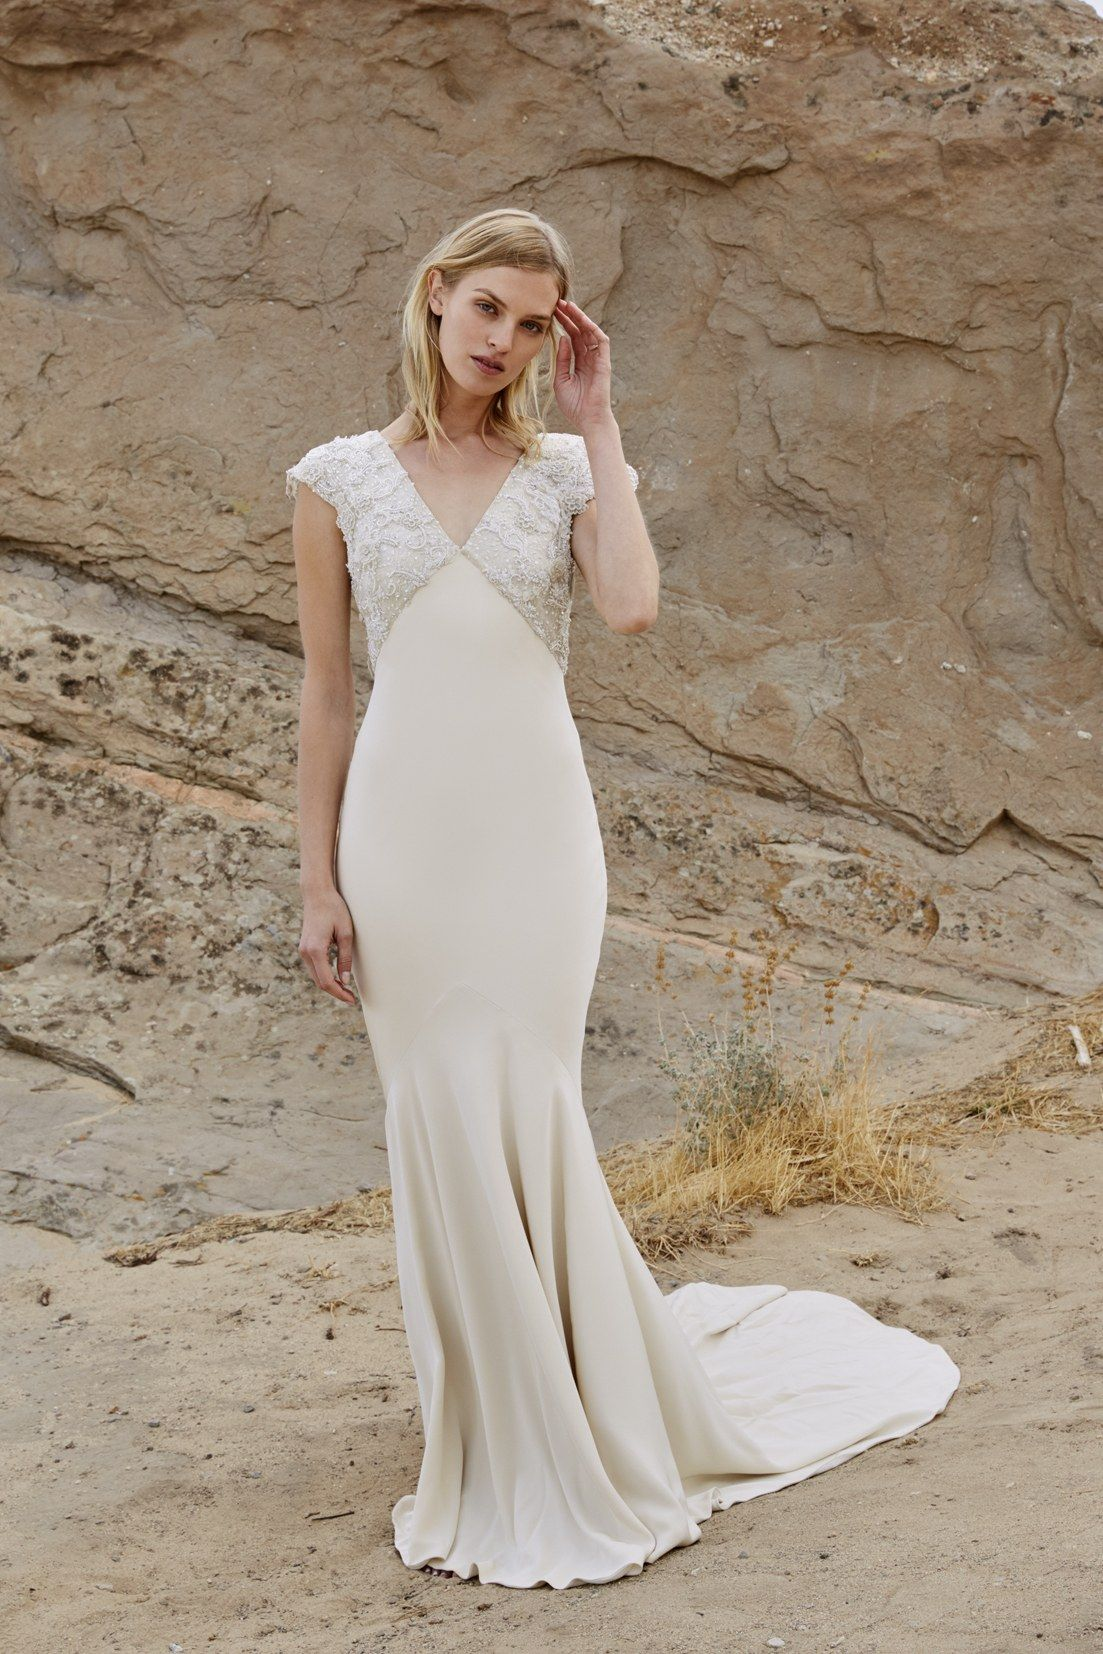 Savannah miller bridal u wedding dress collection fall brides